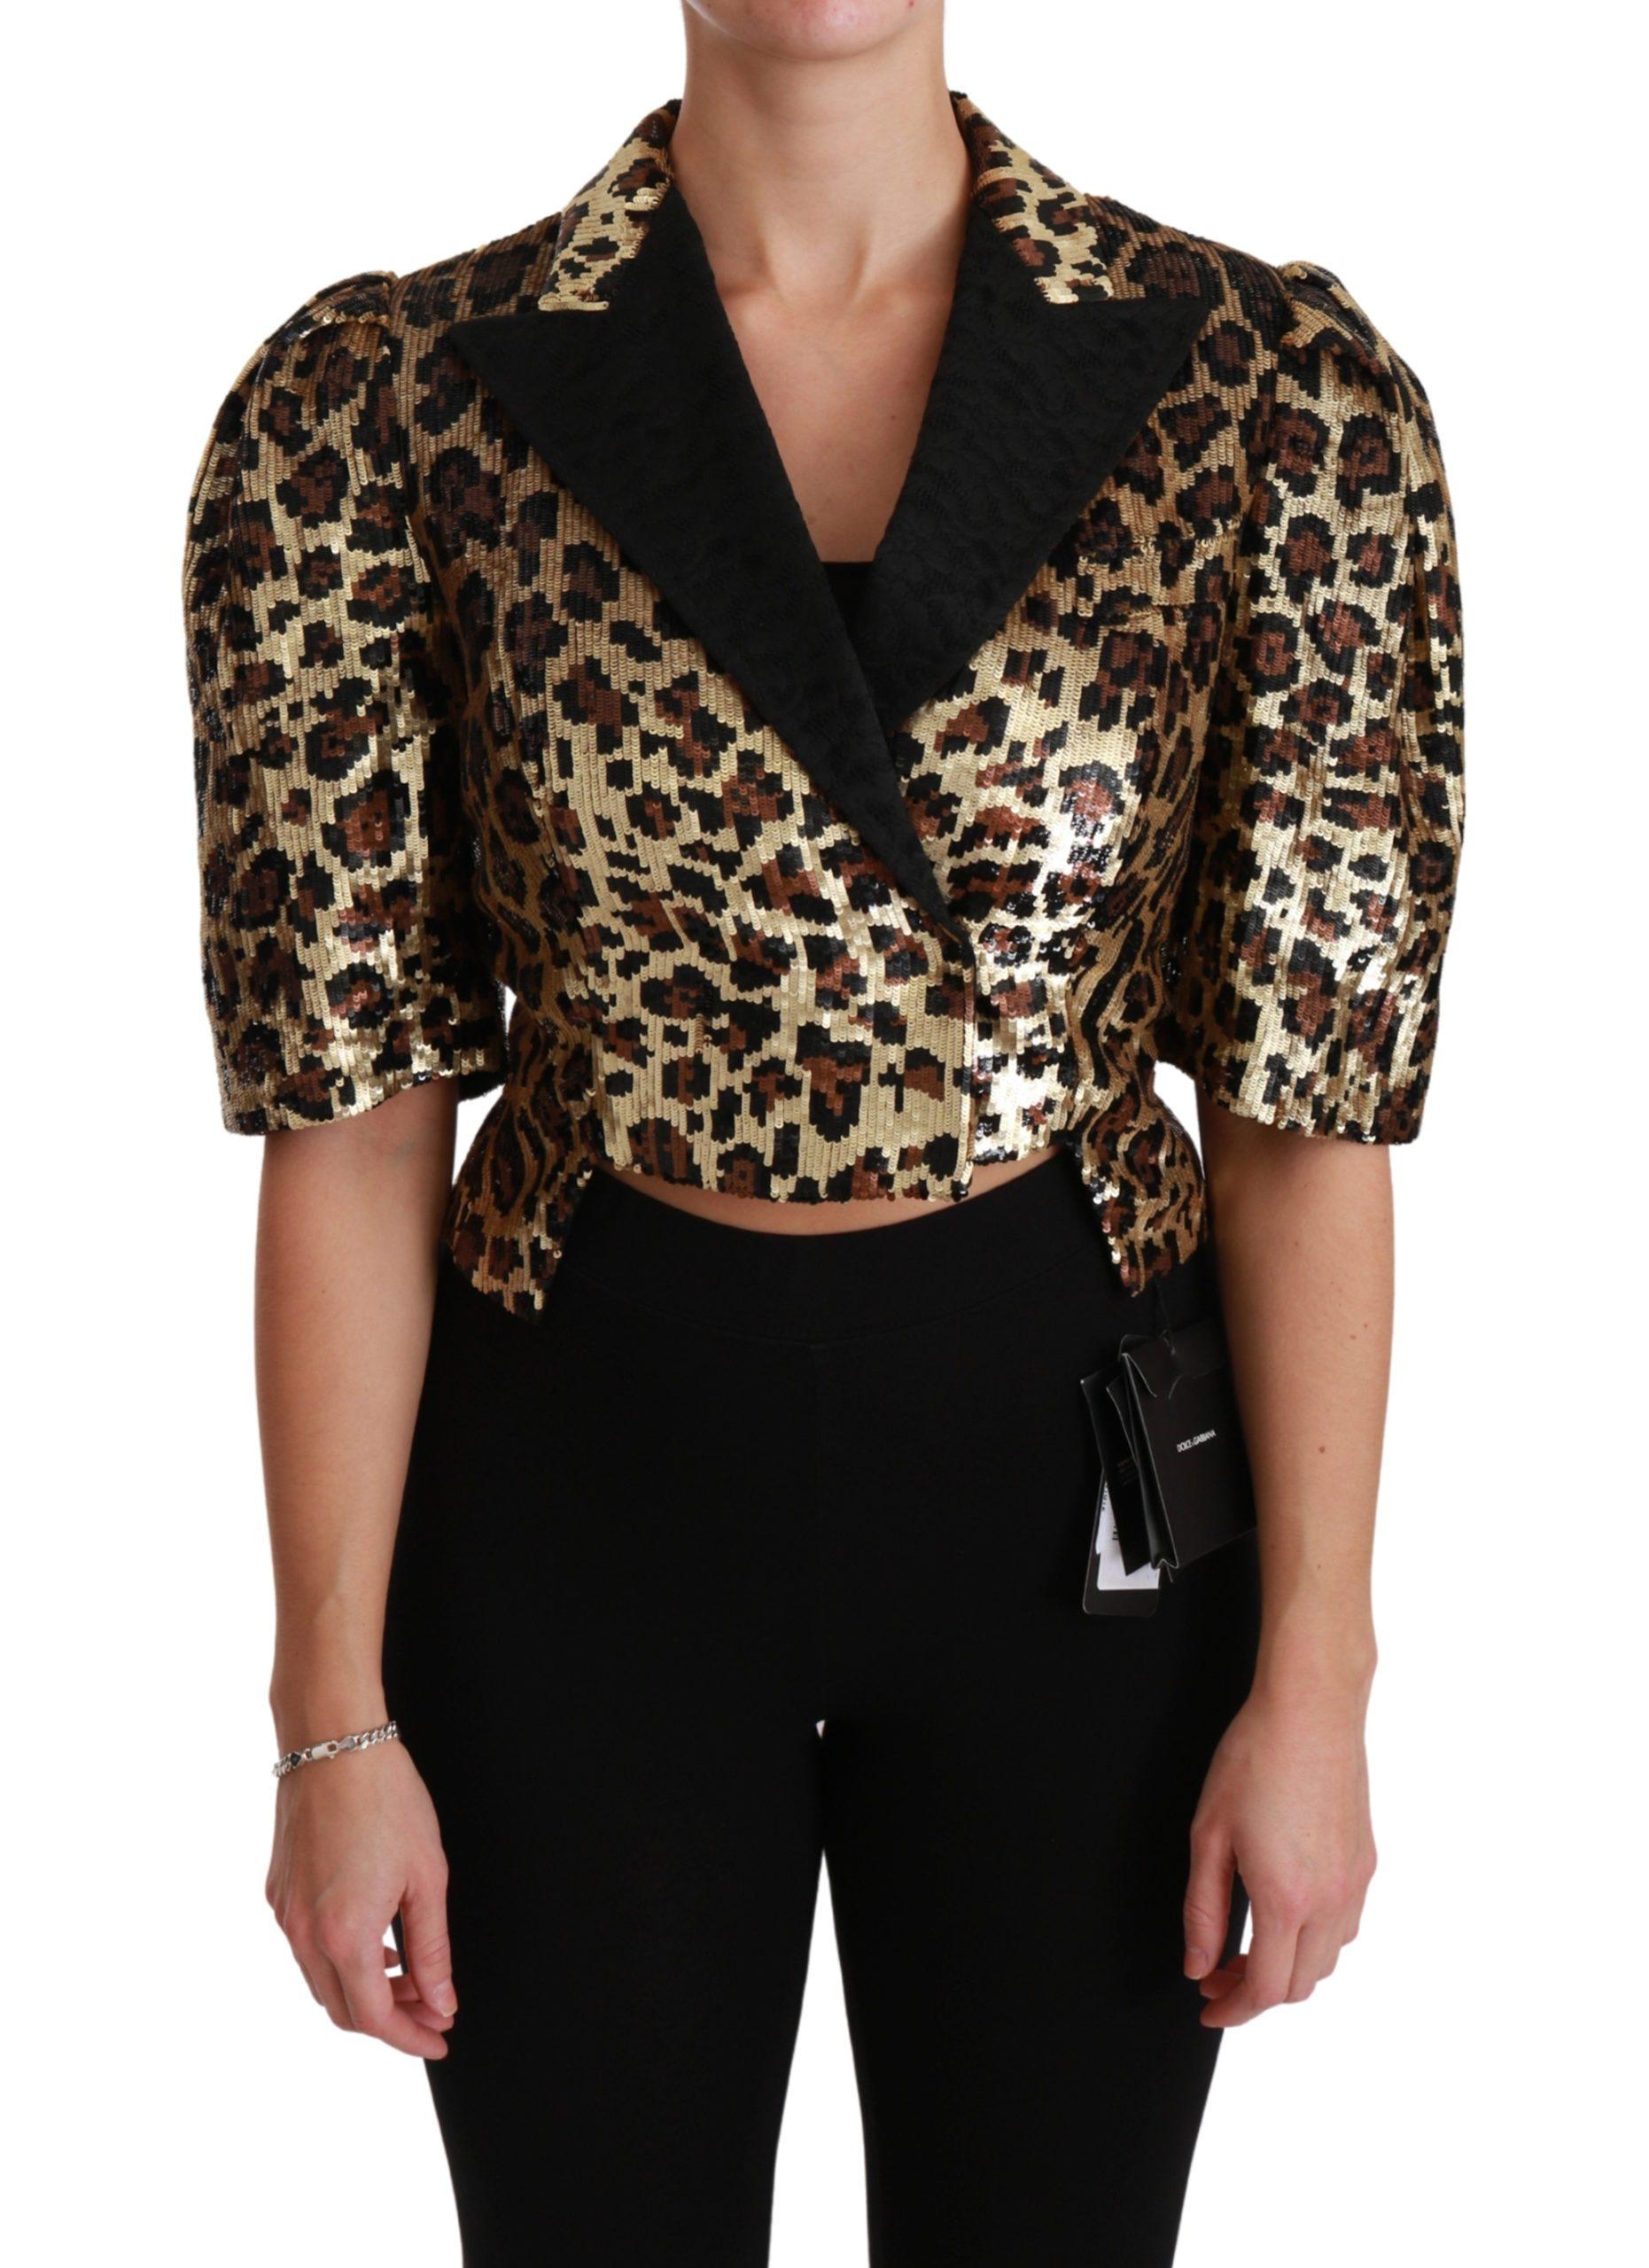 Dolce & Gabbana Women's Leopard Sequined Jacket Yellow JKT2564 - IT36   XS